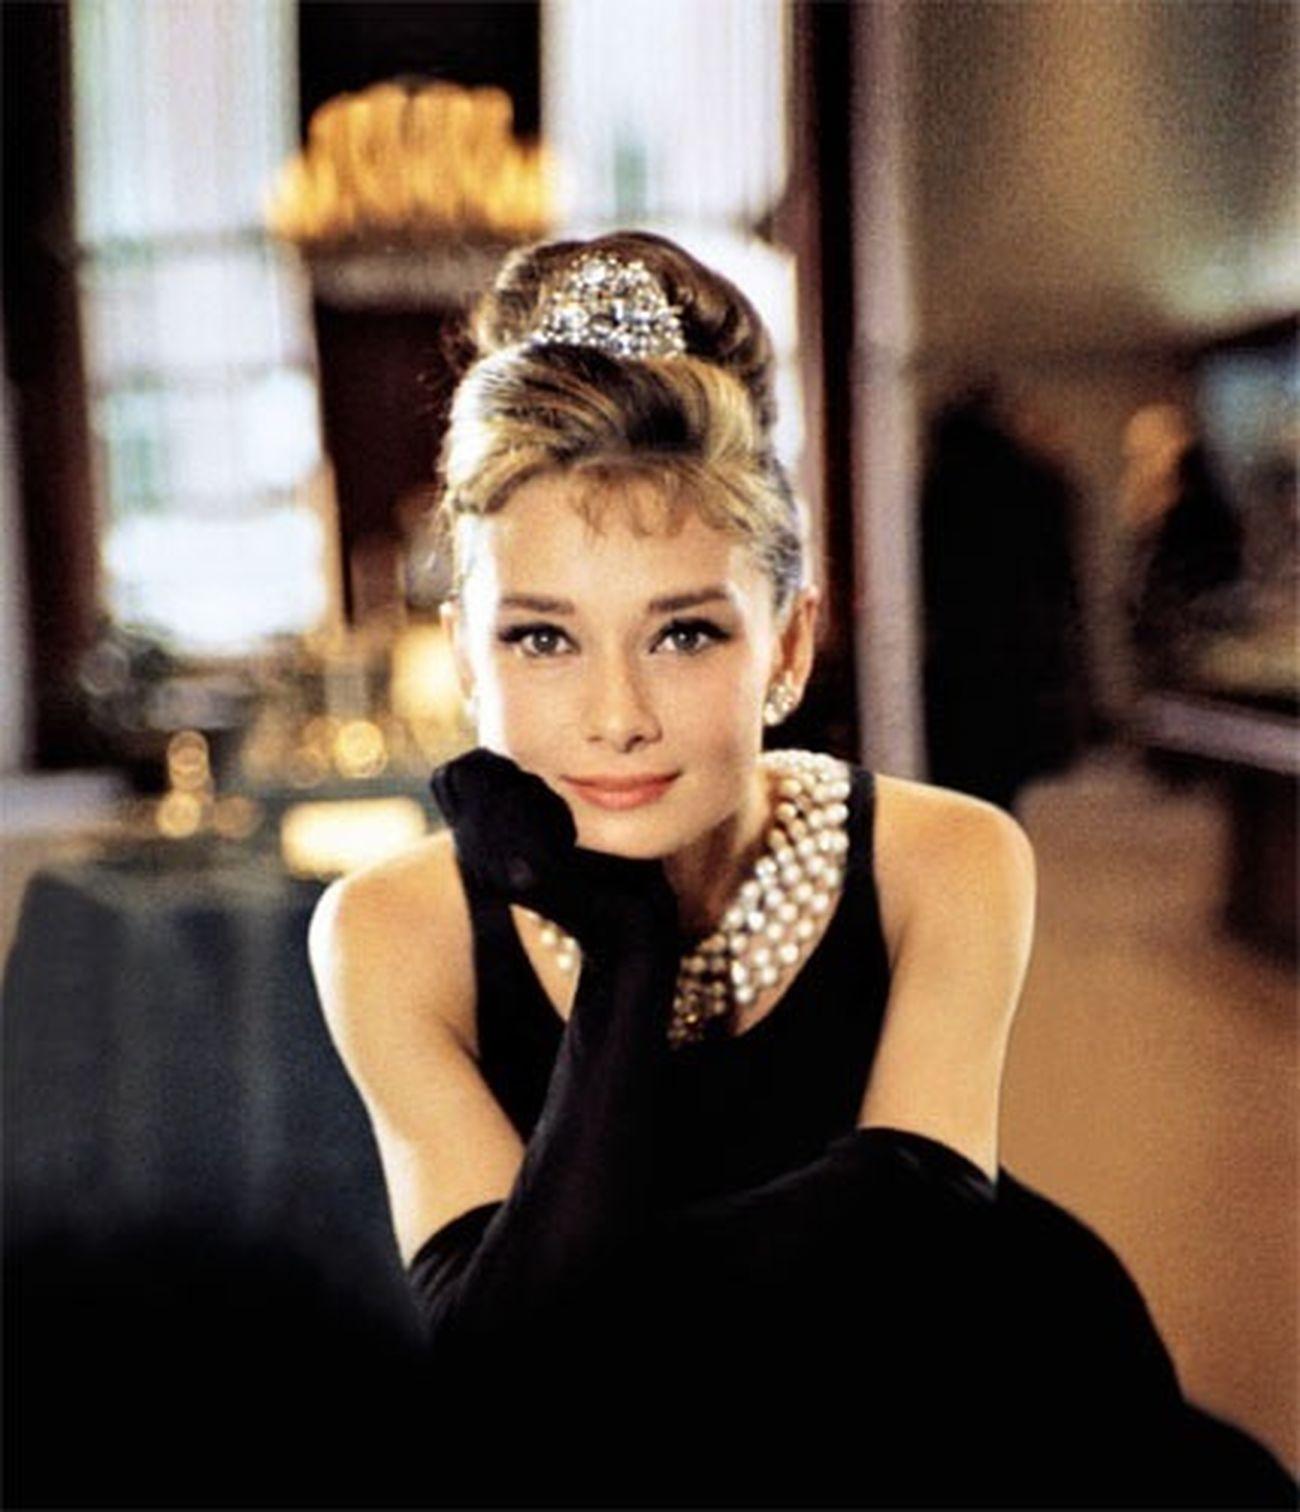 Perfect lady Audrey Hepburn Perfection